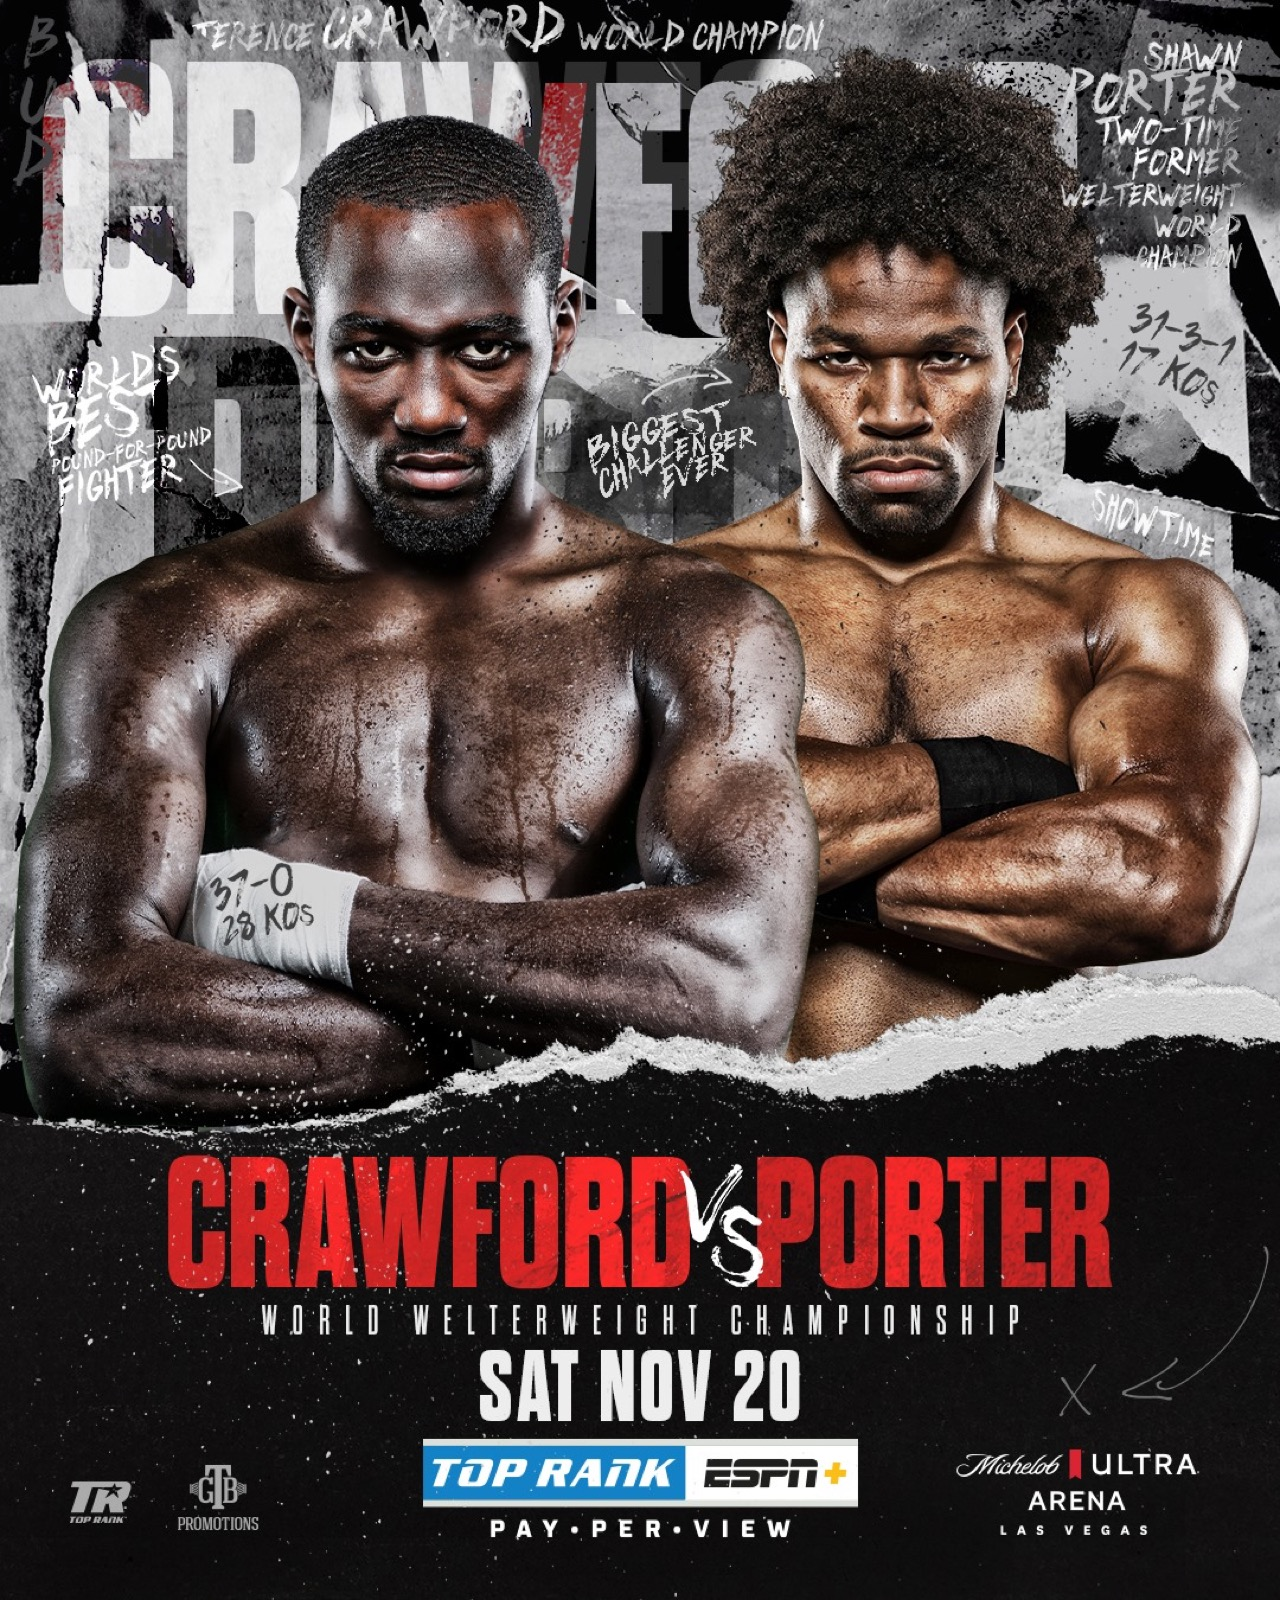 Crawford vs Porter - ESPN+ - Nov. 20 - 9 pm ET